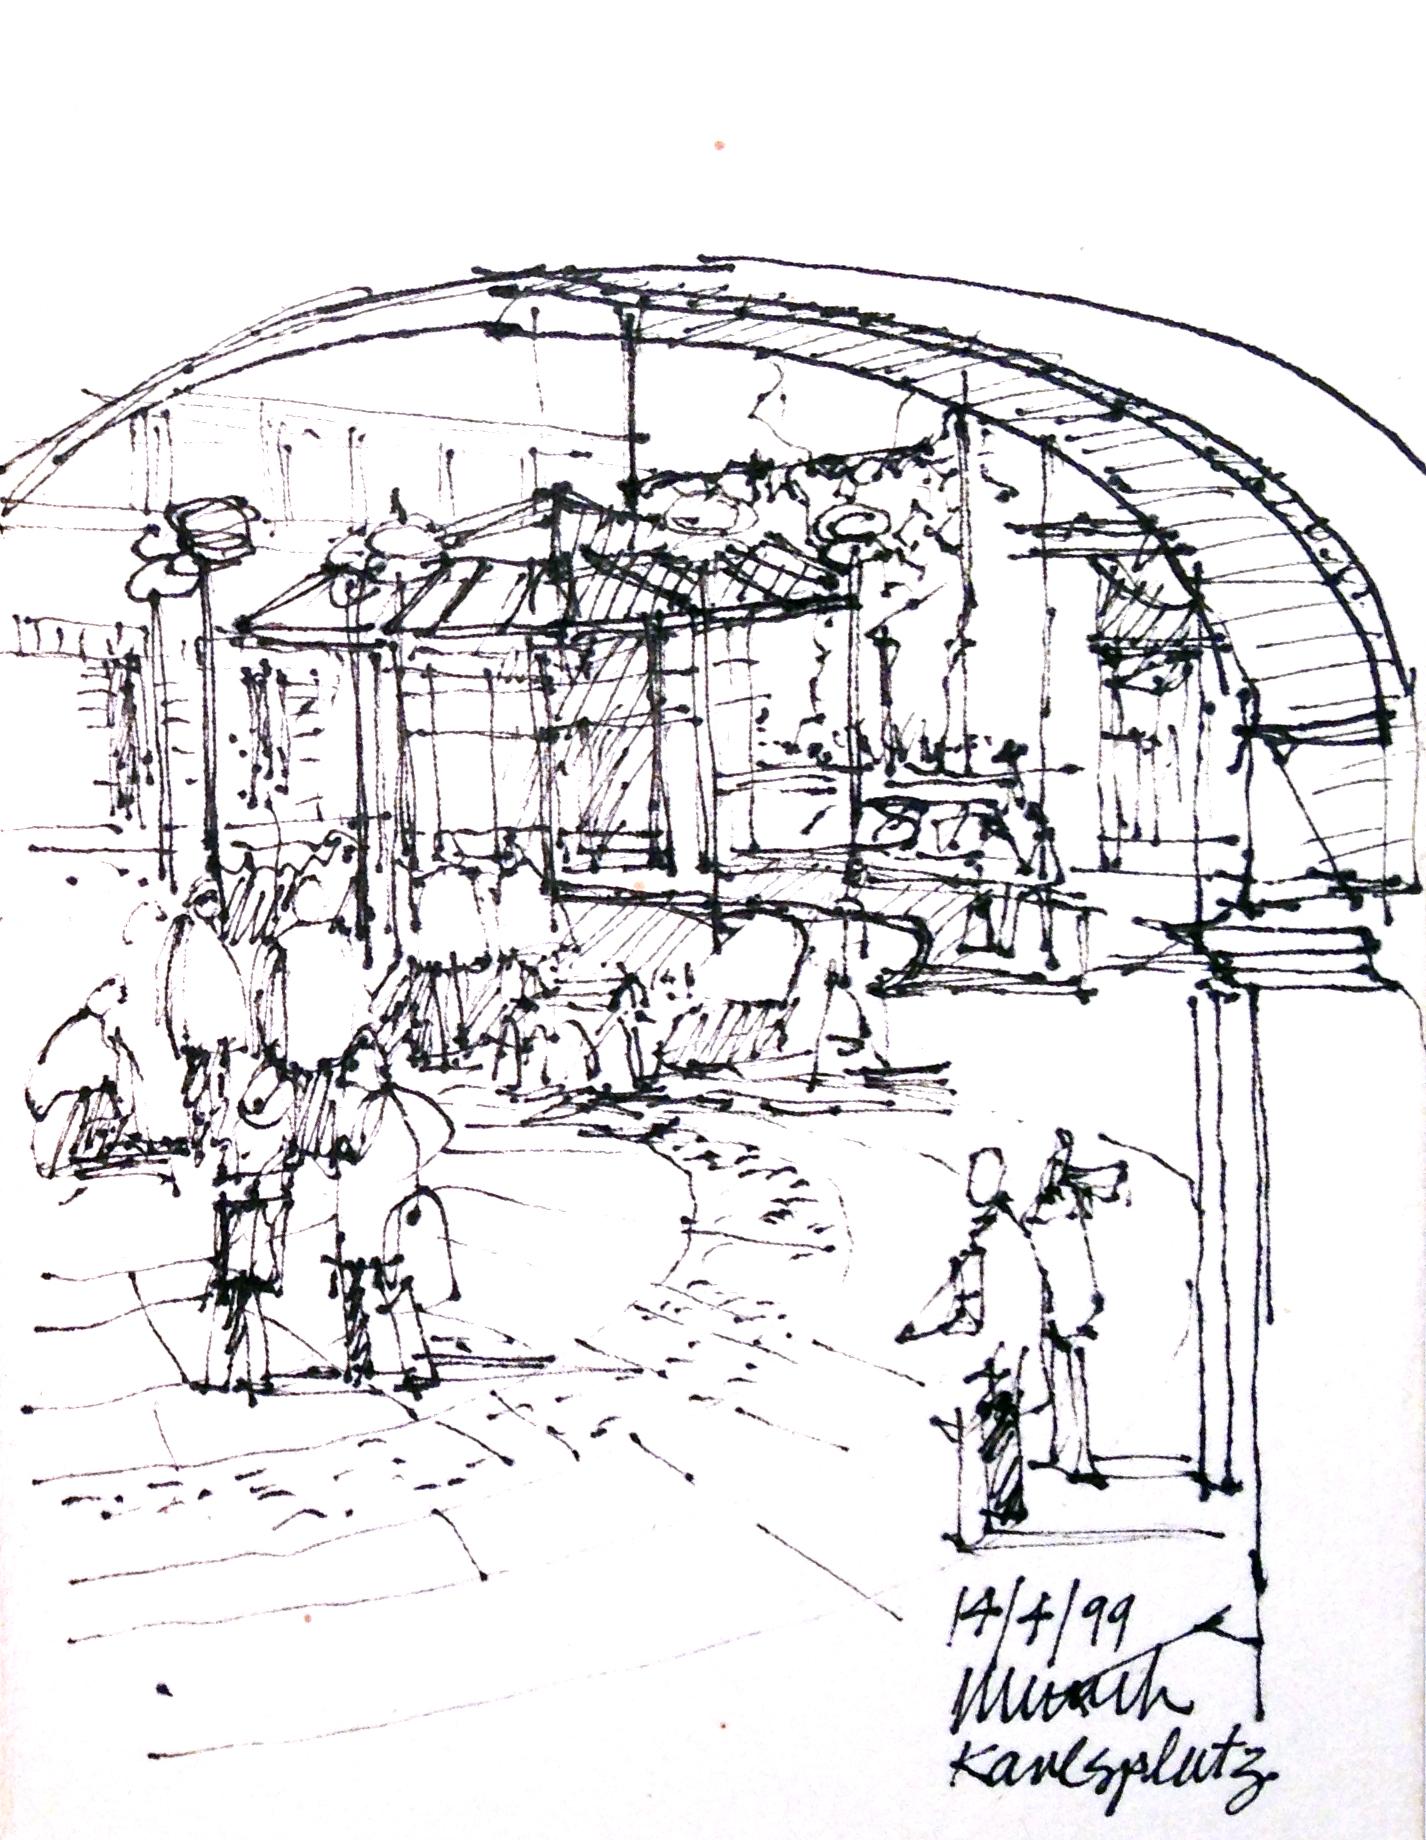 Sketchingjourneys Blog FreeHand OnSite Sketching By Errol - Modern building sketches